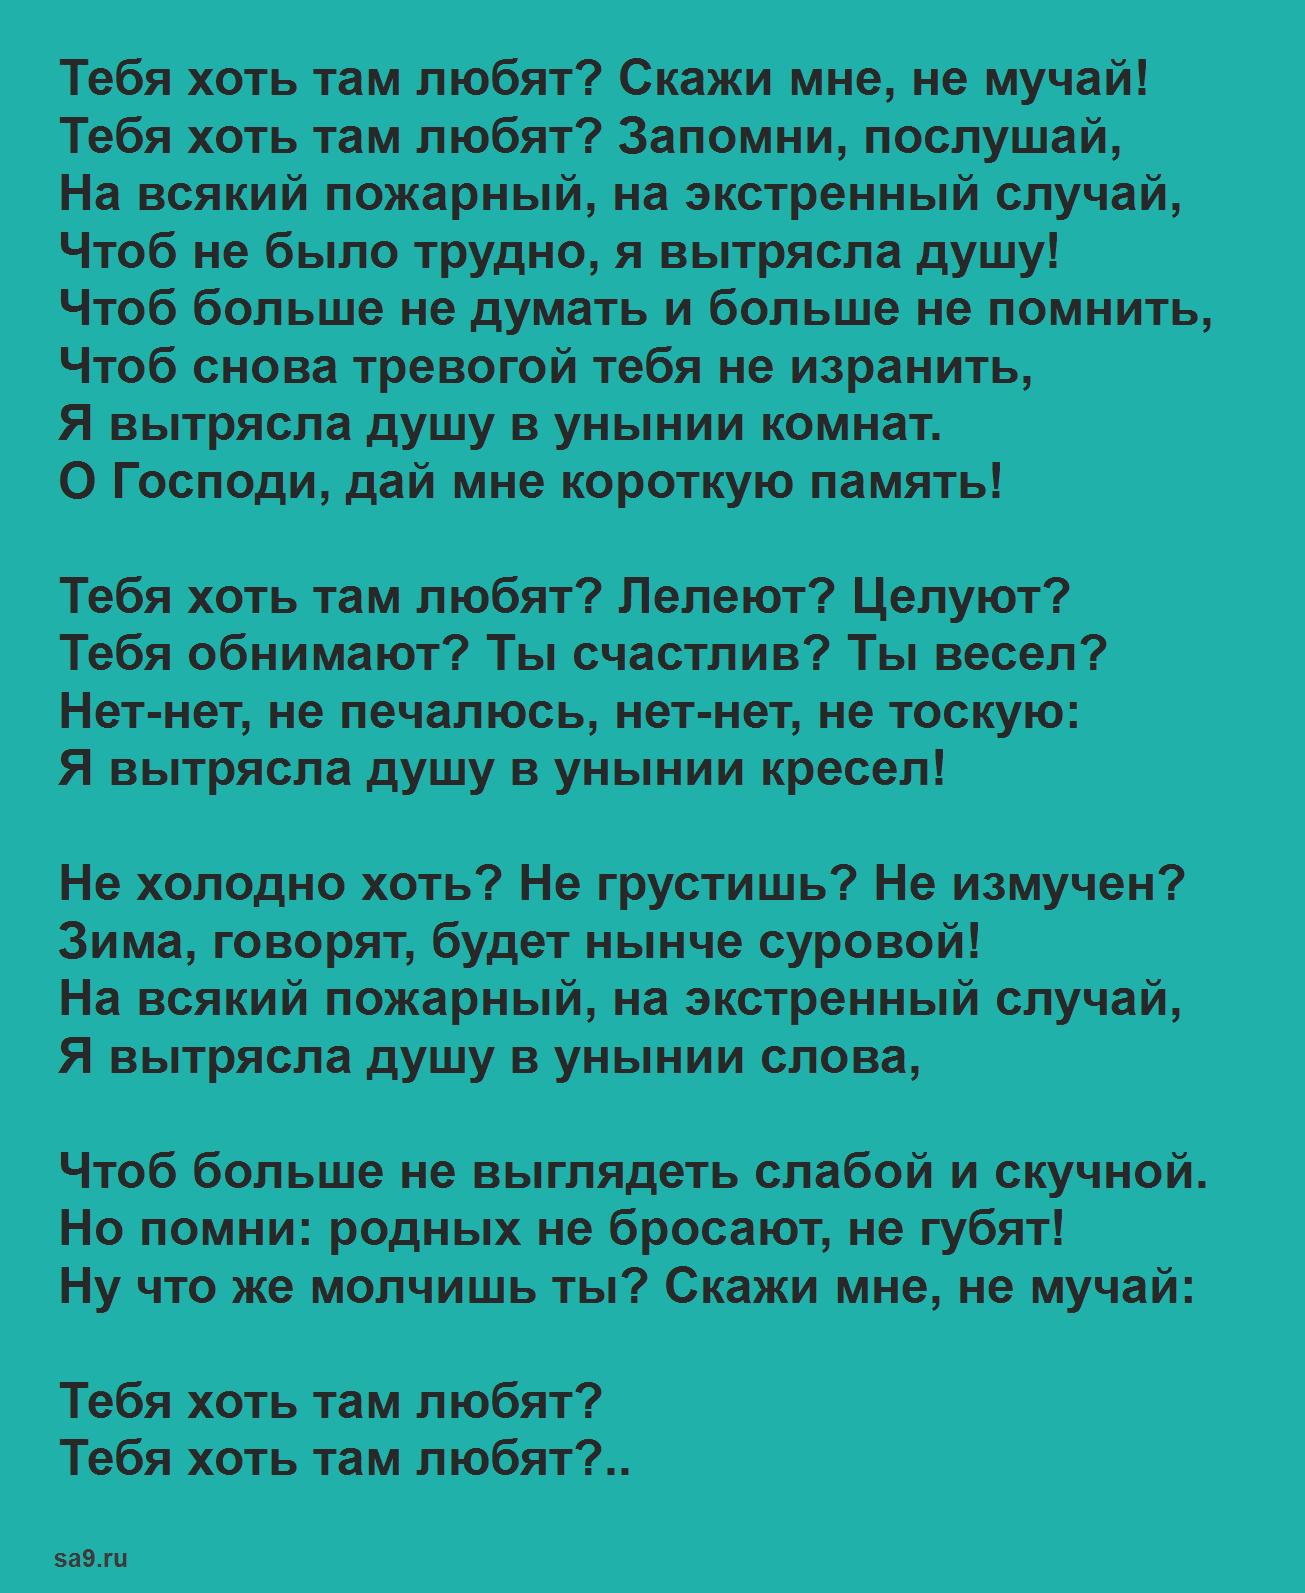 Читать стихи Астаховой - Тебя хоть там любят?